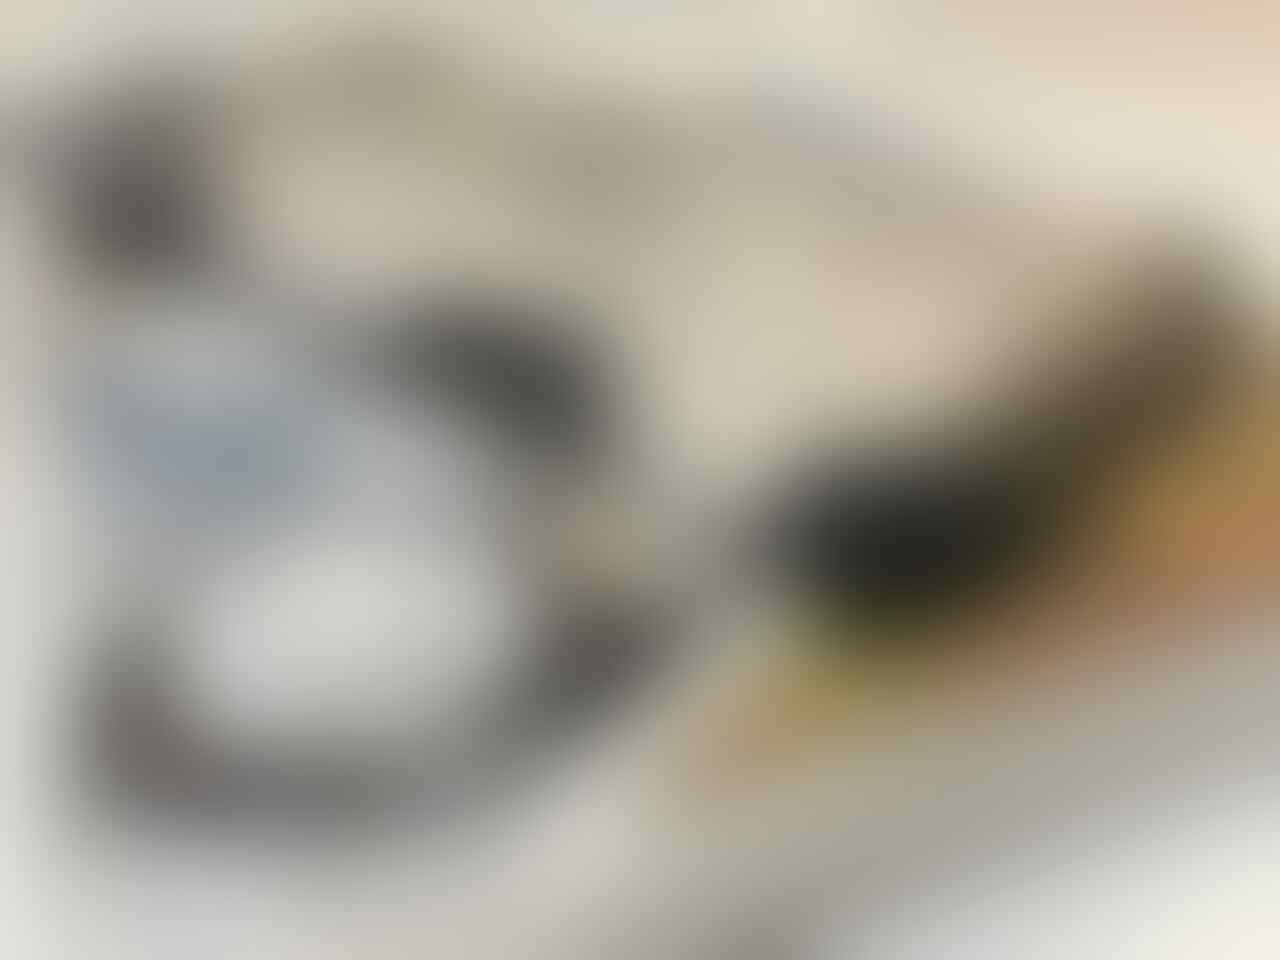 UAG MILITARY CASE ORIGINAL FOR IPHONE 6 PLUS / 6S PLUS MURAAHH 350 SAJA [MALANG]